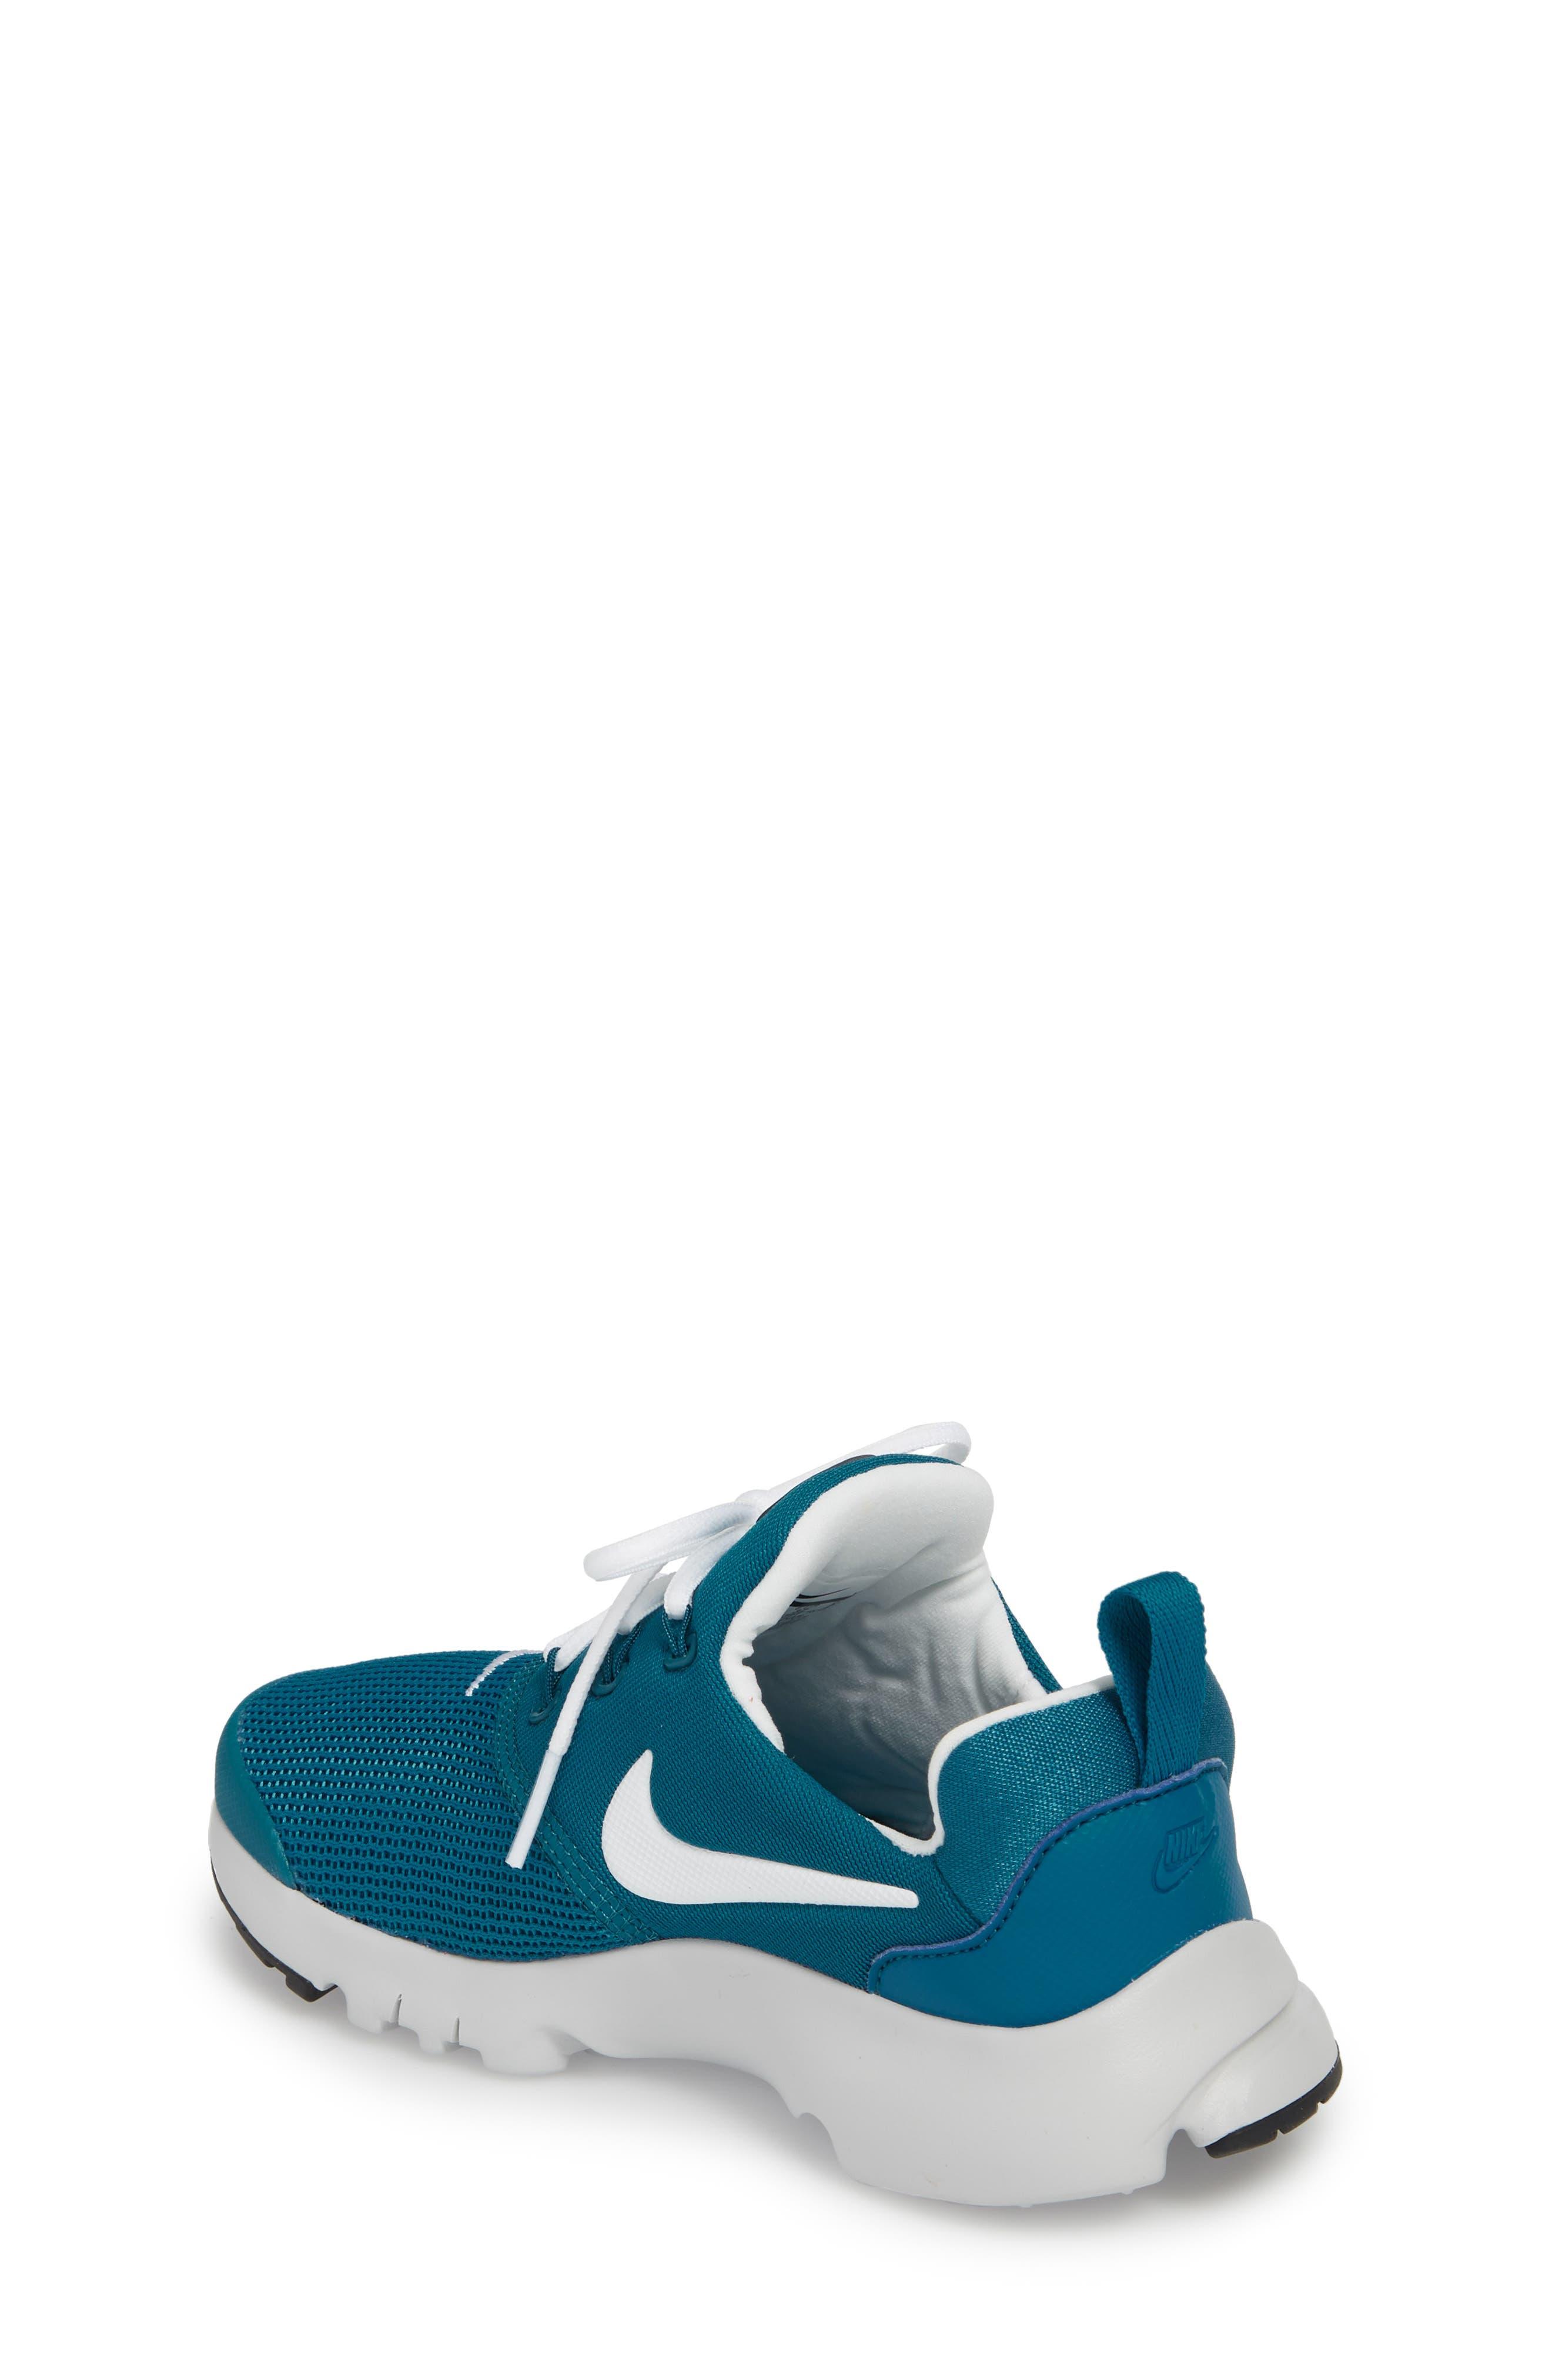 Presto Fly Sneaker,                             Alternate thumbnail 2, color,                             440